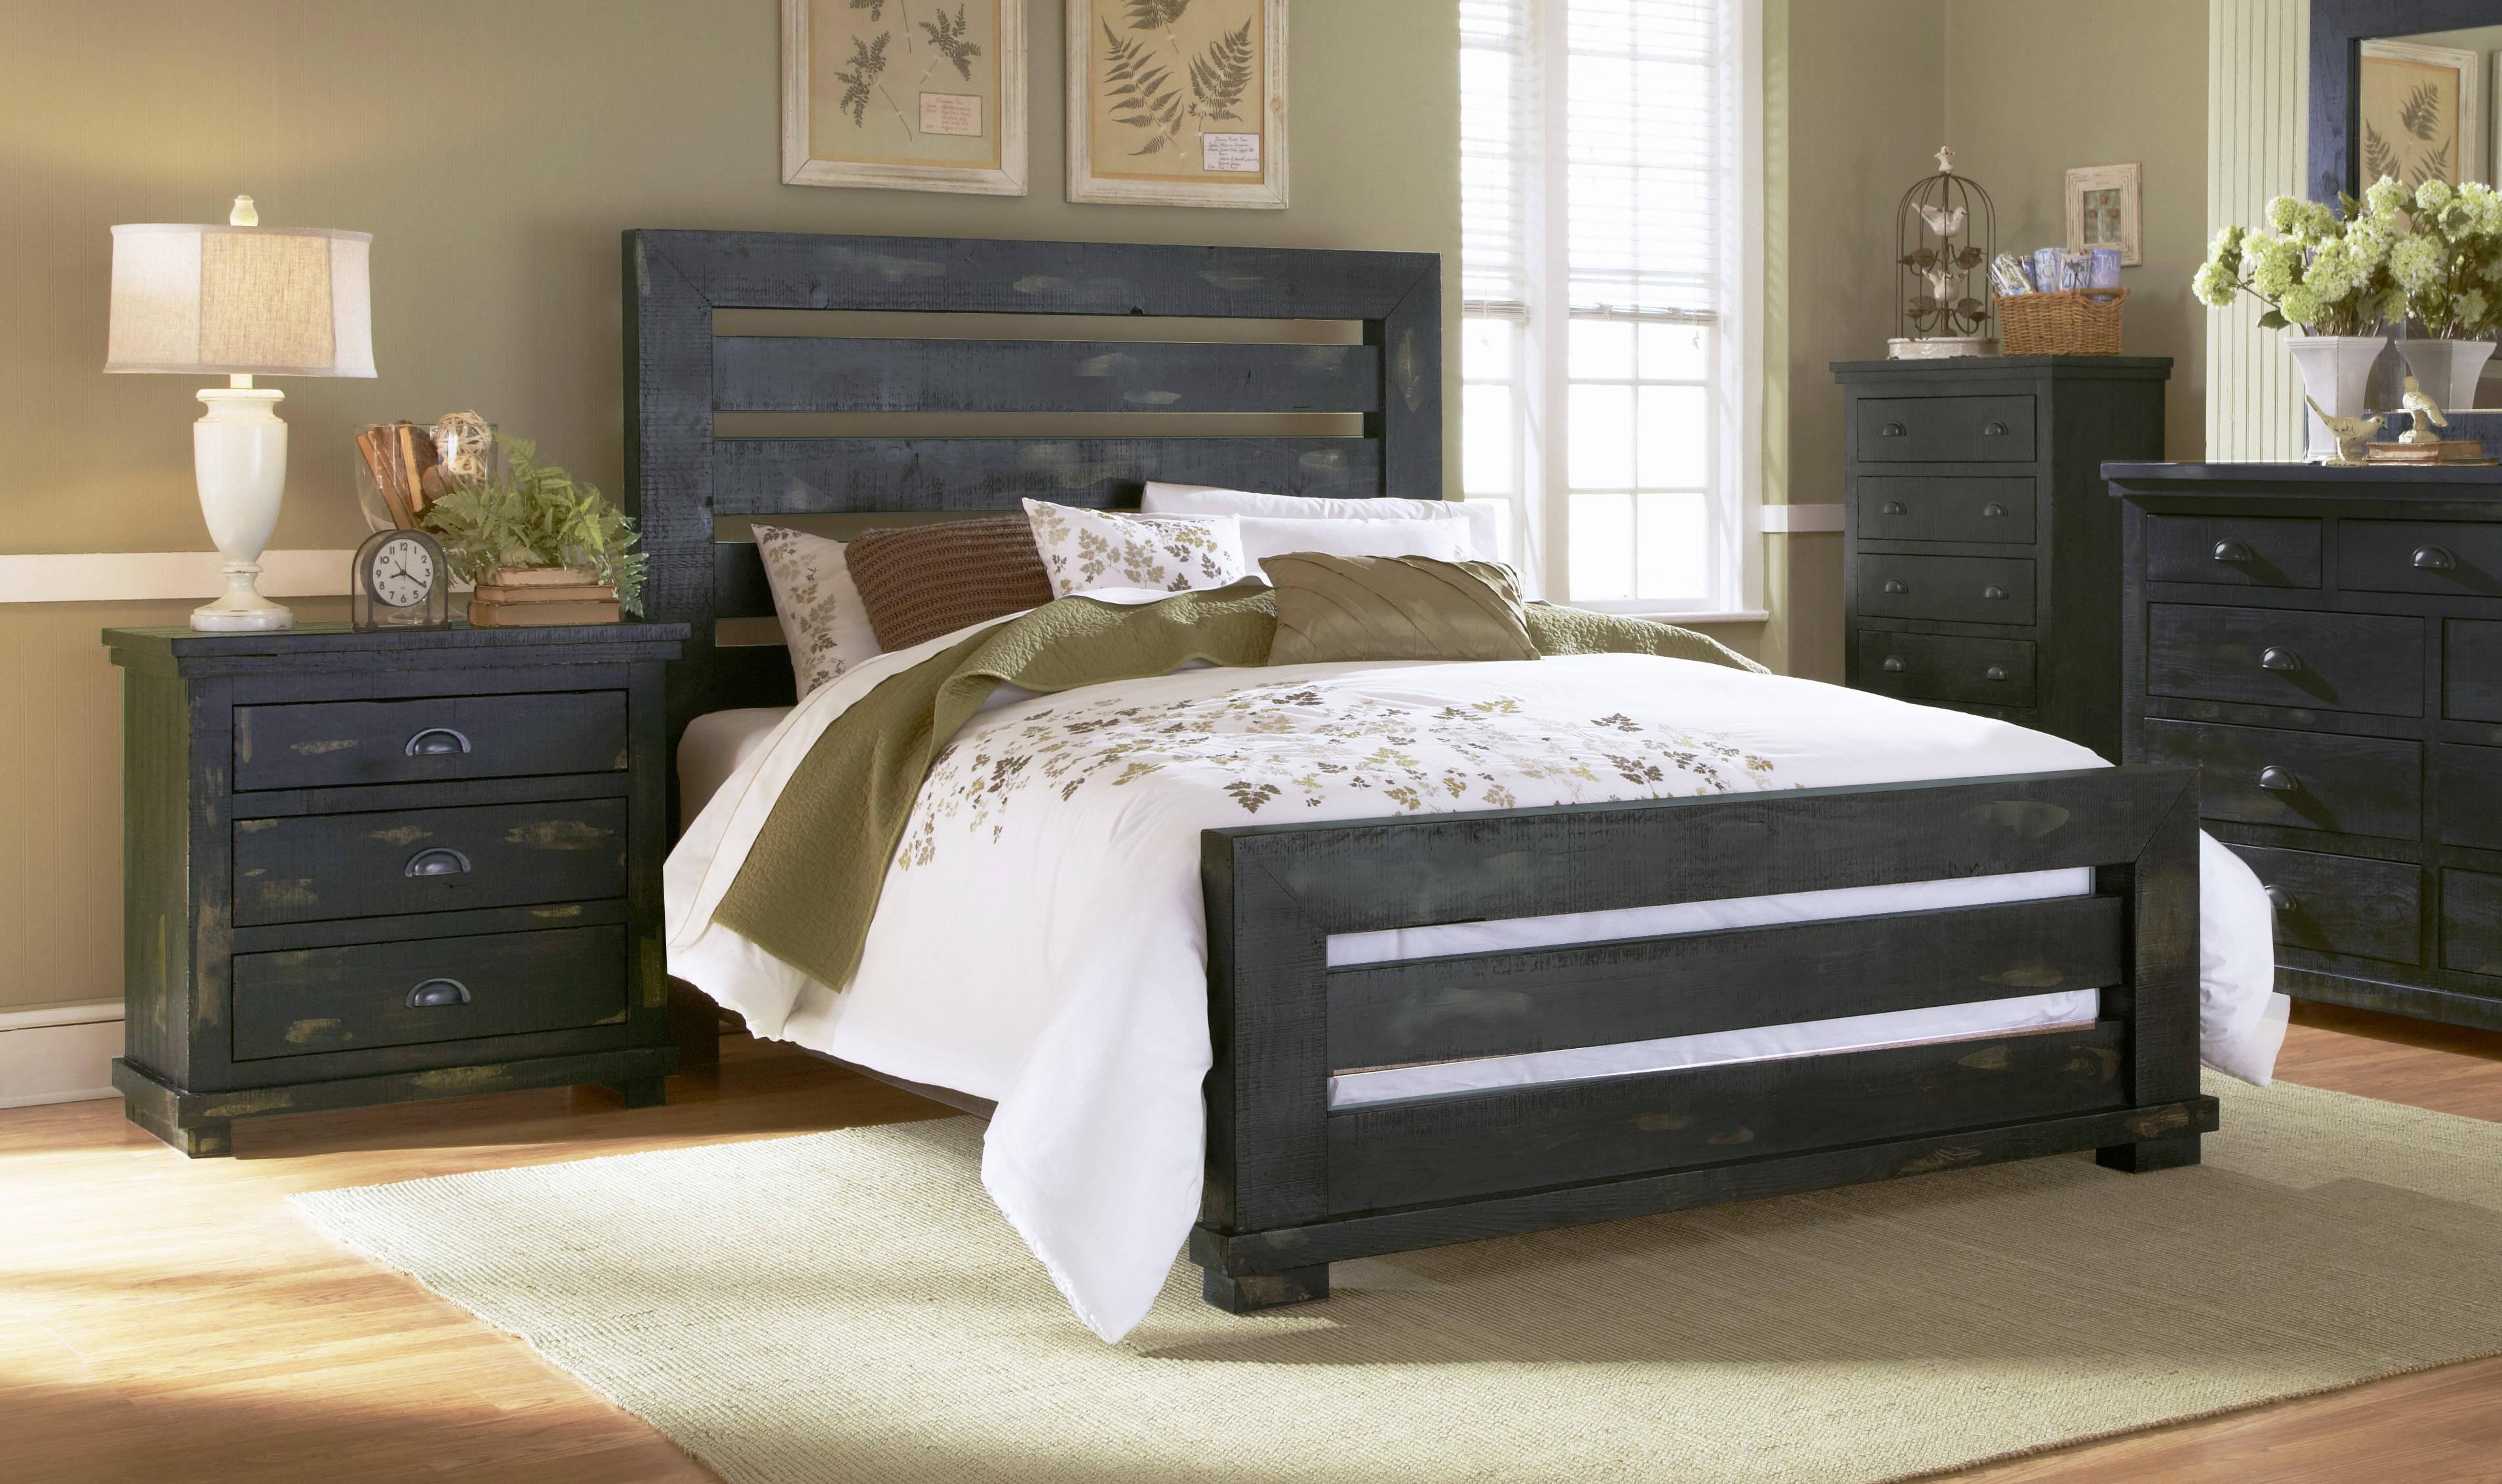 Progressive Furniture Willow Distressed Black 2Pc Bedroom Set With Queen  Slat Bed in Black Distressed Bedroom Furniture